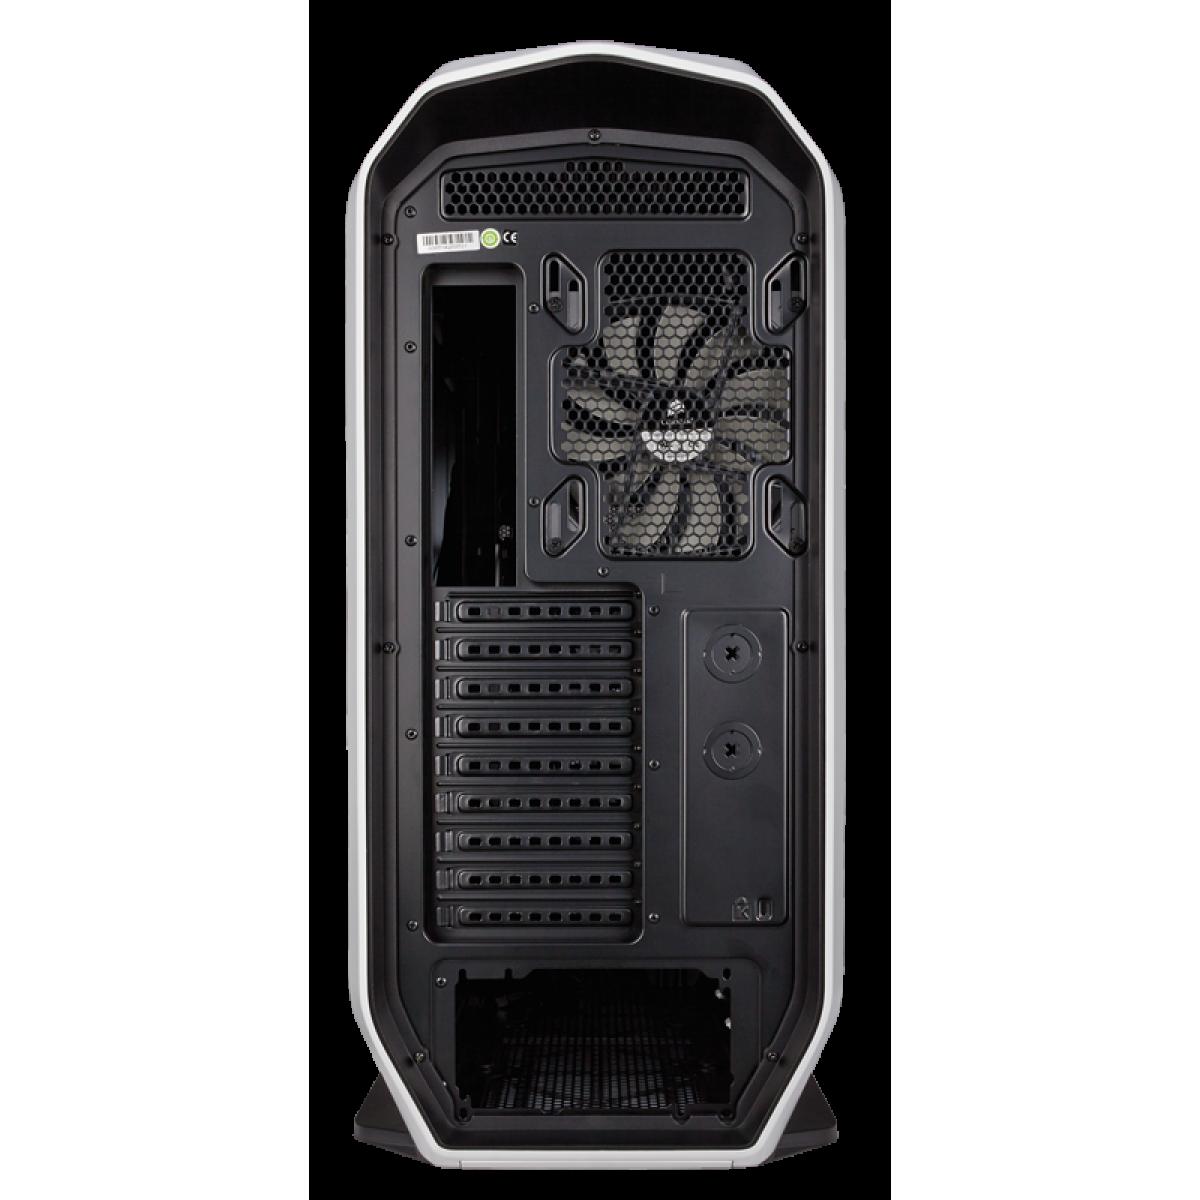 Gabinete Gamer Corsair Graphite 780T, Full Tower, Com 3 Fans, Lateral em Acrílico, White, S-Fonte, CC-9011059-WW